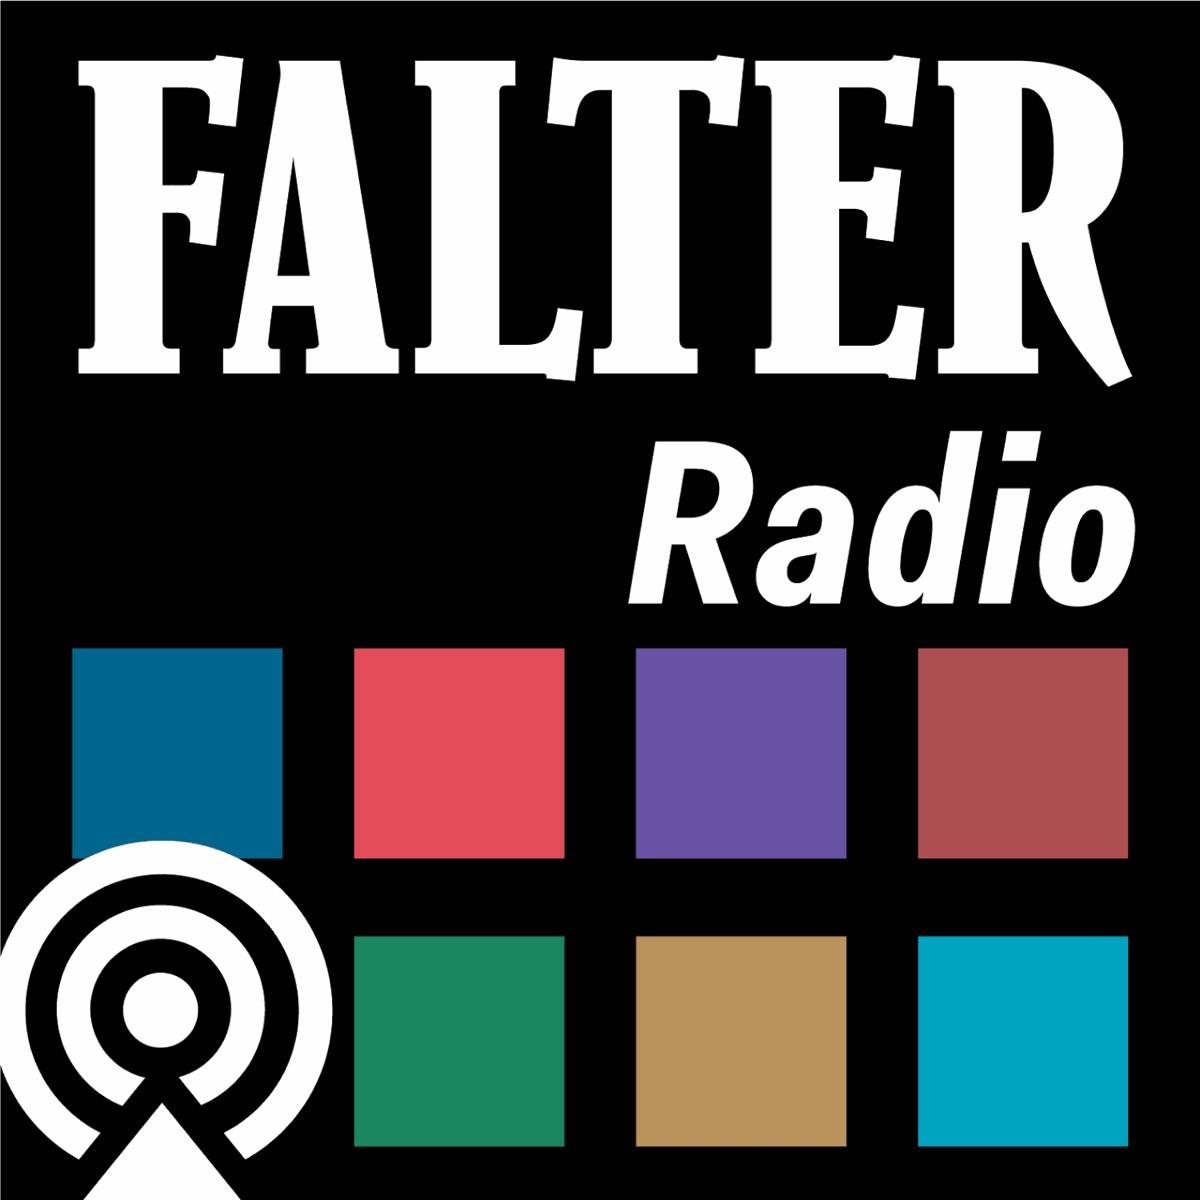 FALTER Radio